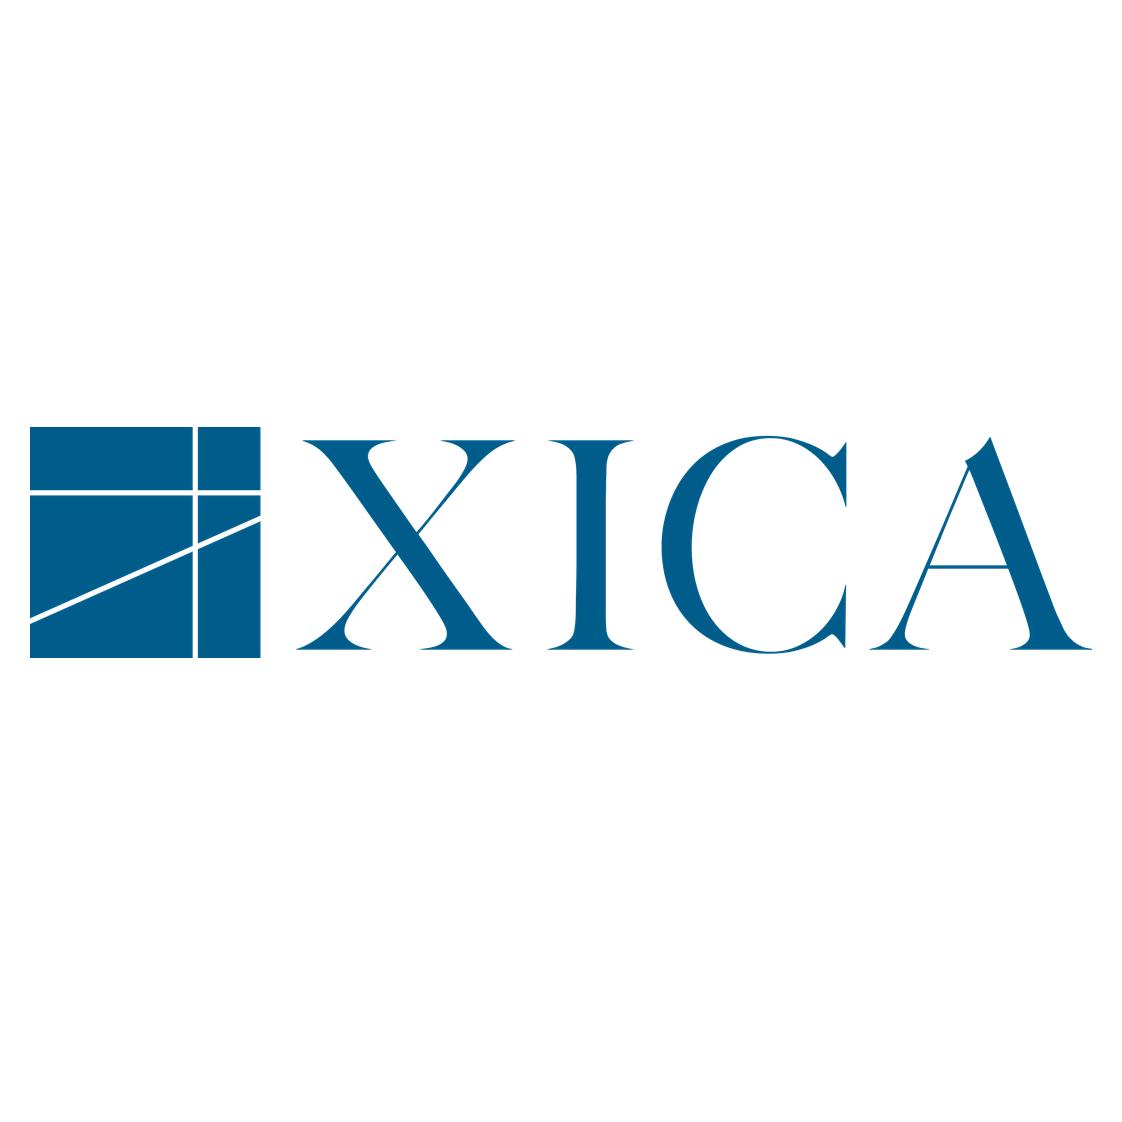 XICA CO, LTD.